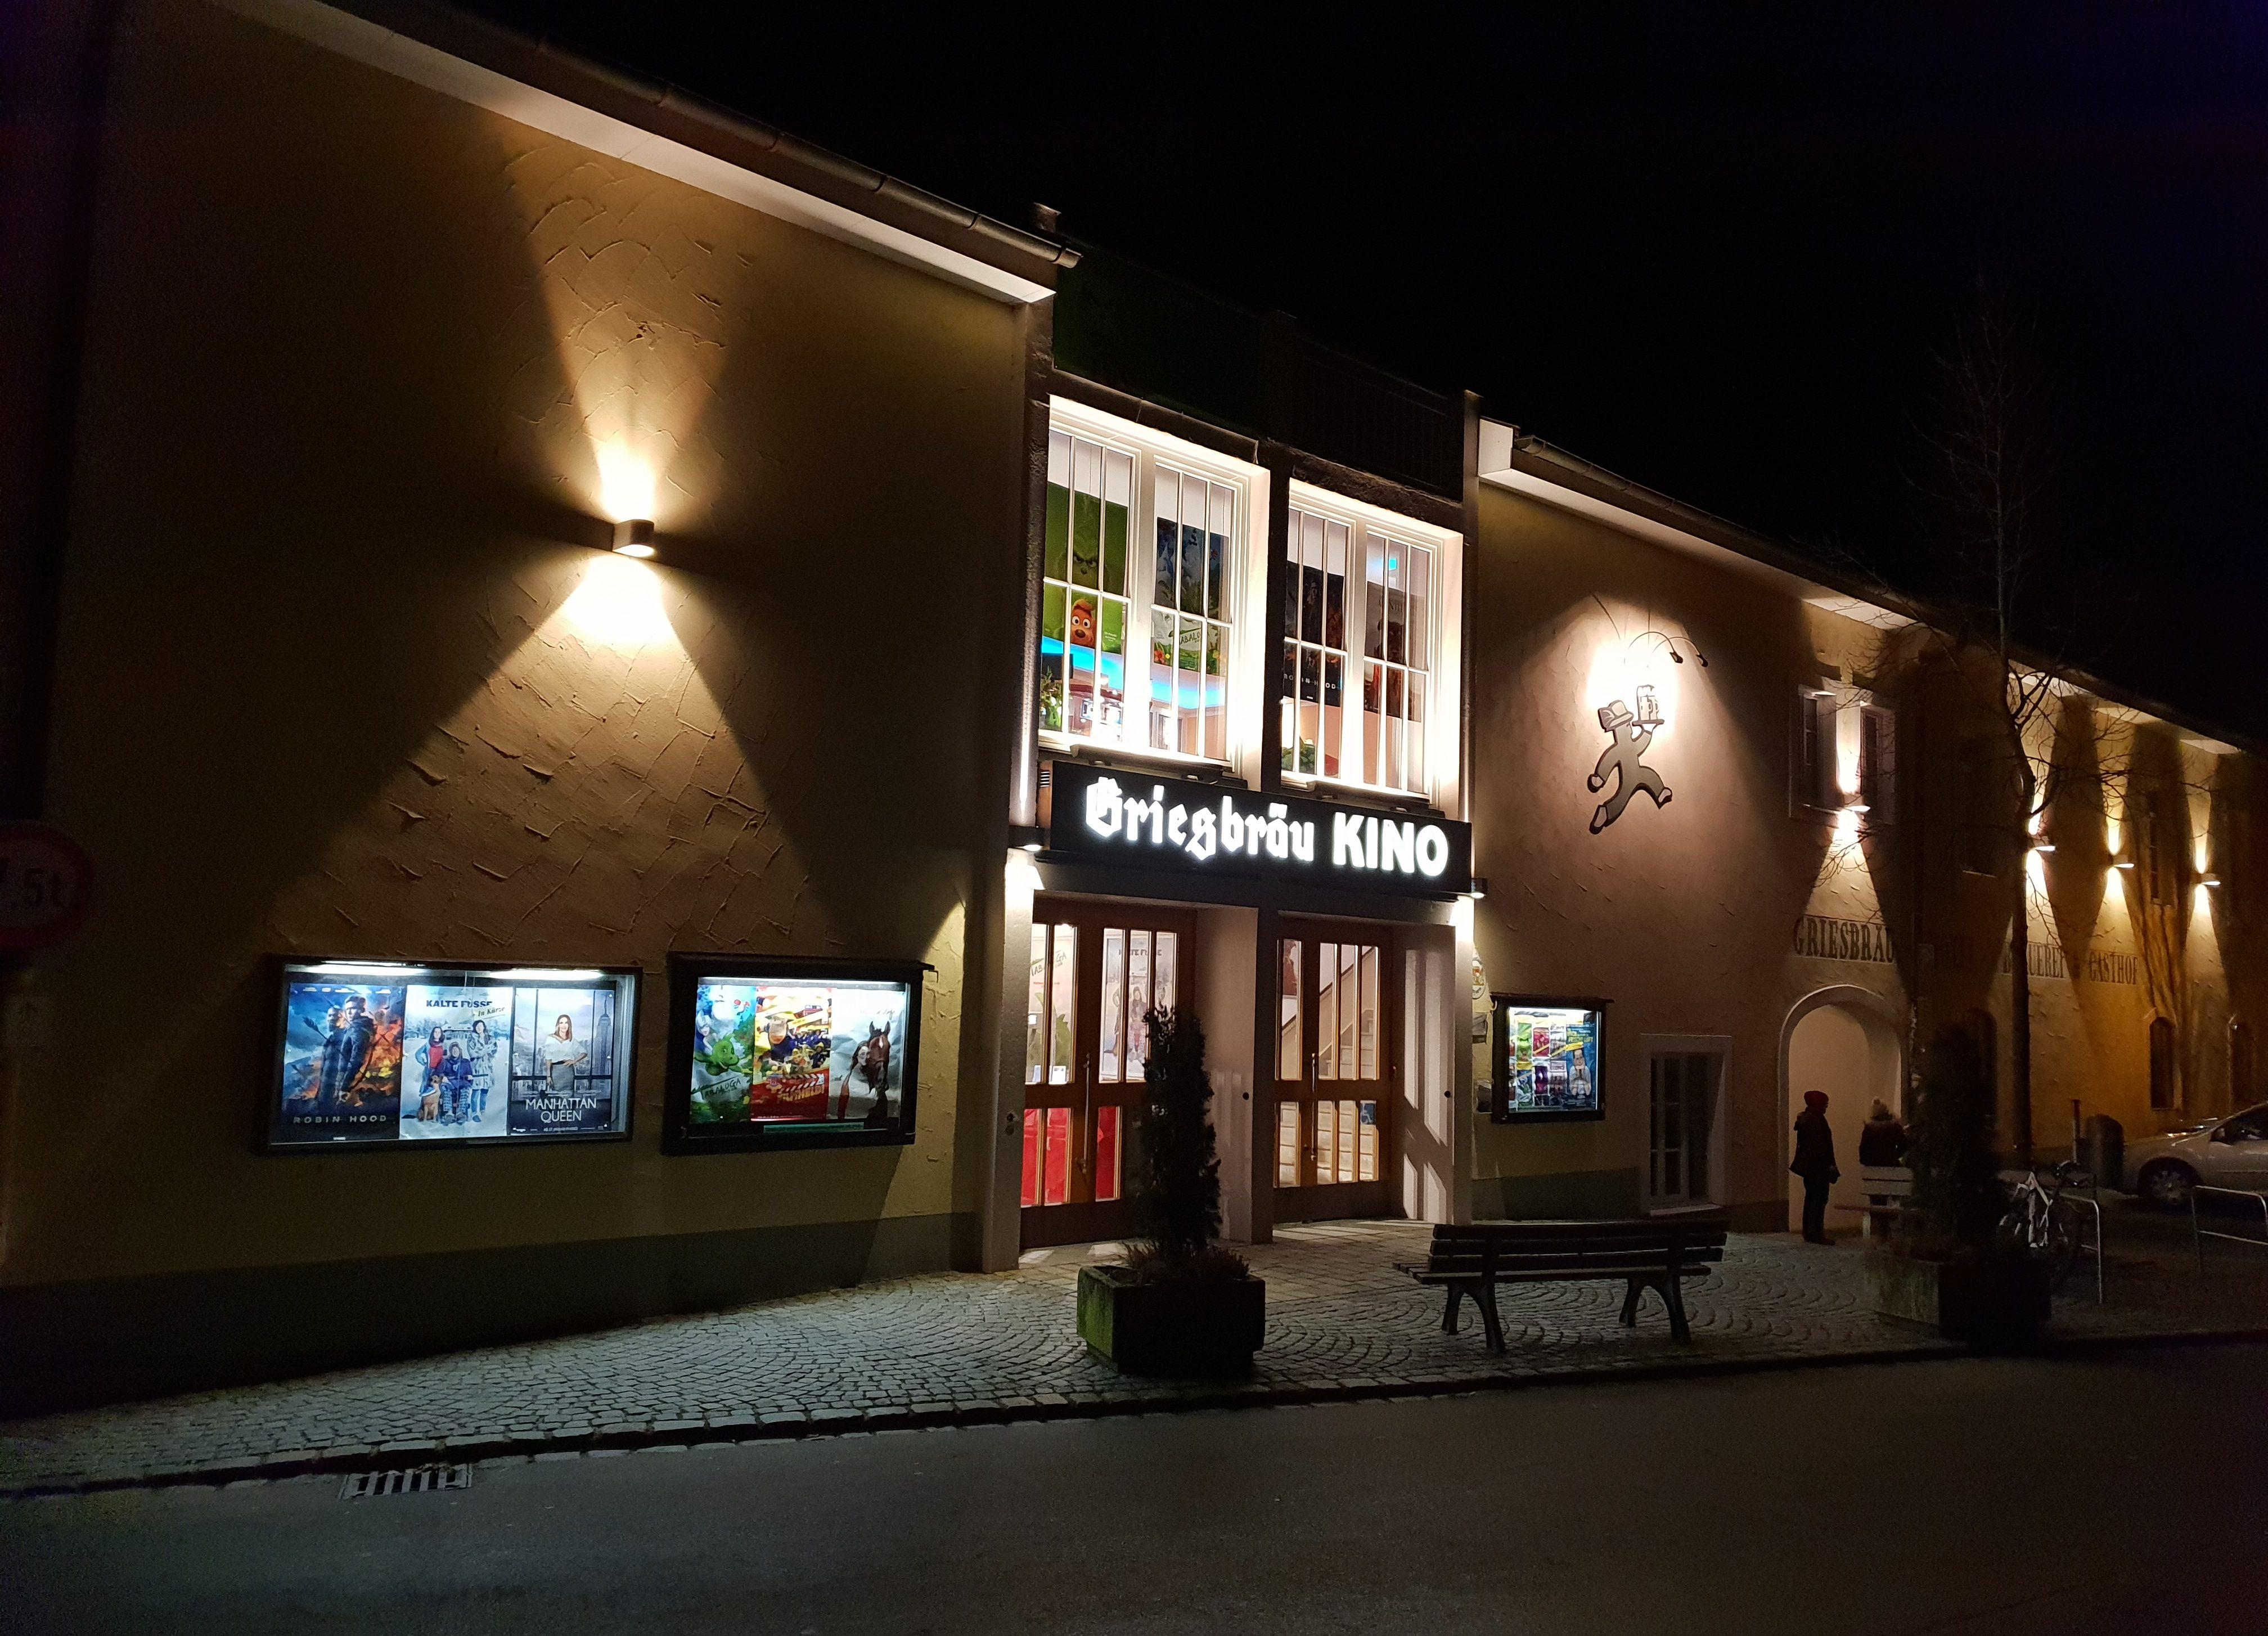 Griesbräu Kino